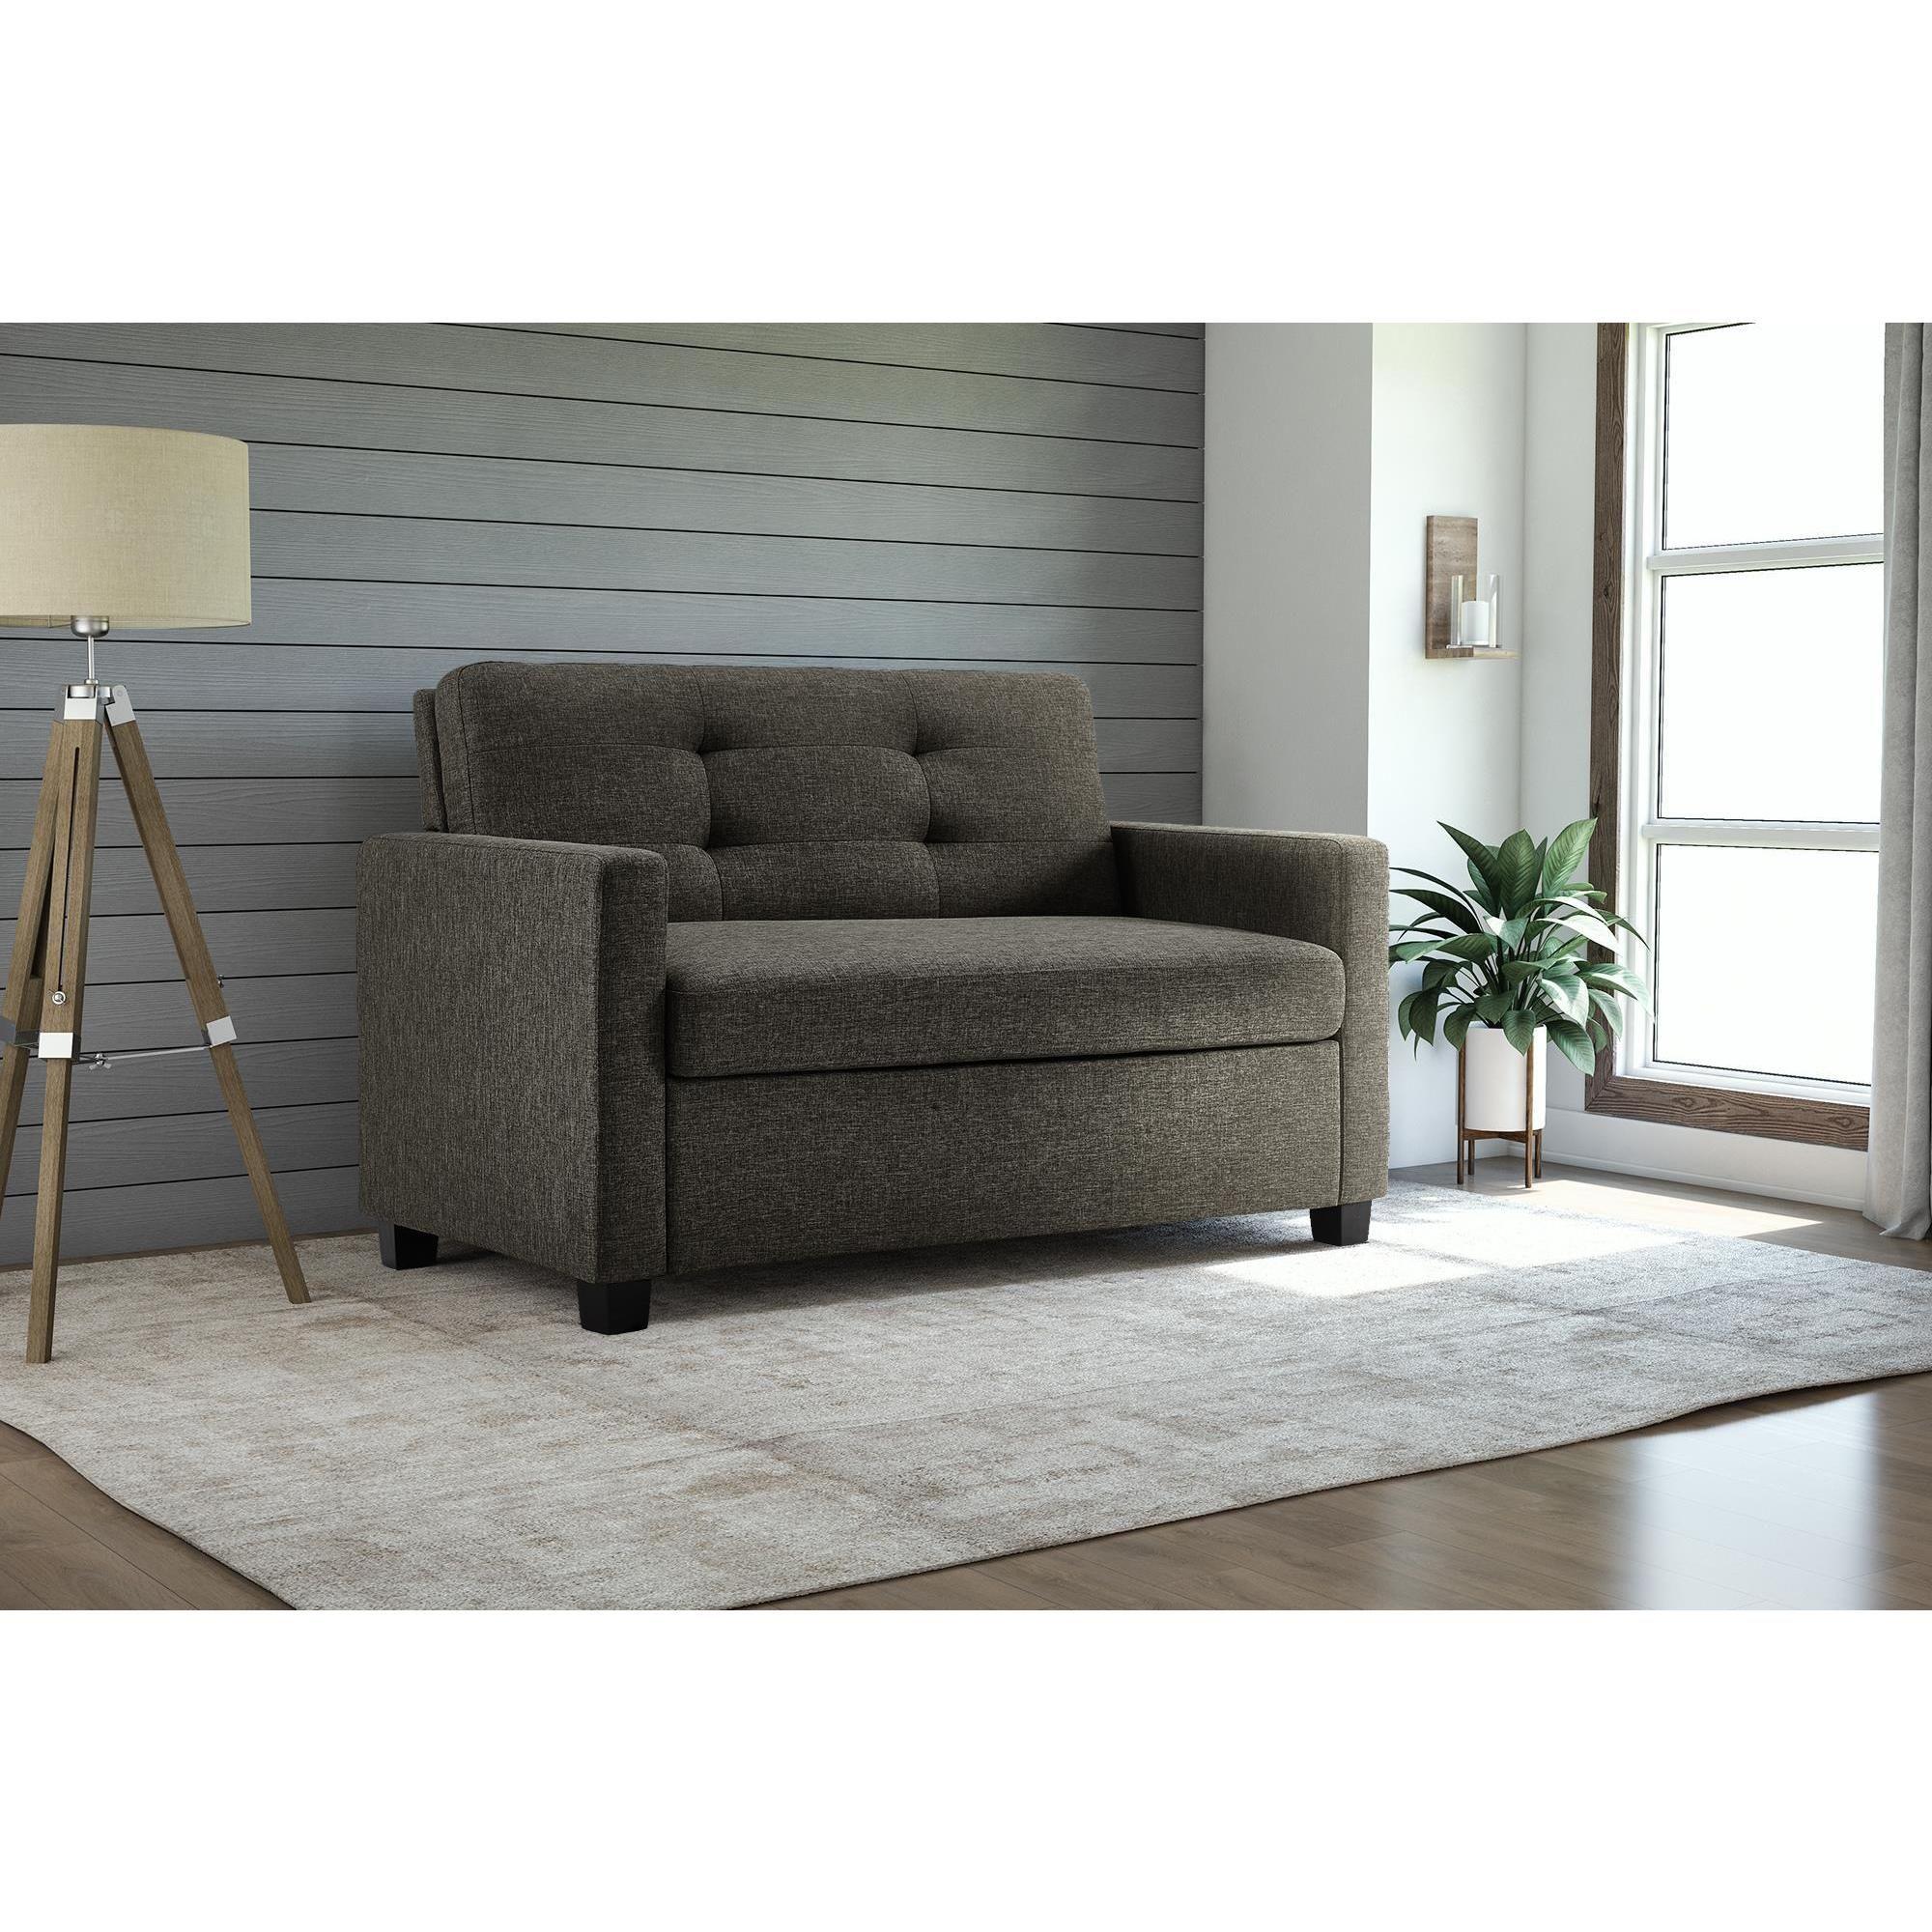 DHP Signature Sleep Devon Grey Linen Twin Sleeper Sofa by DHP